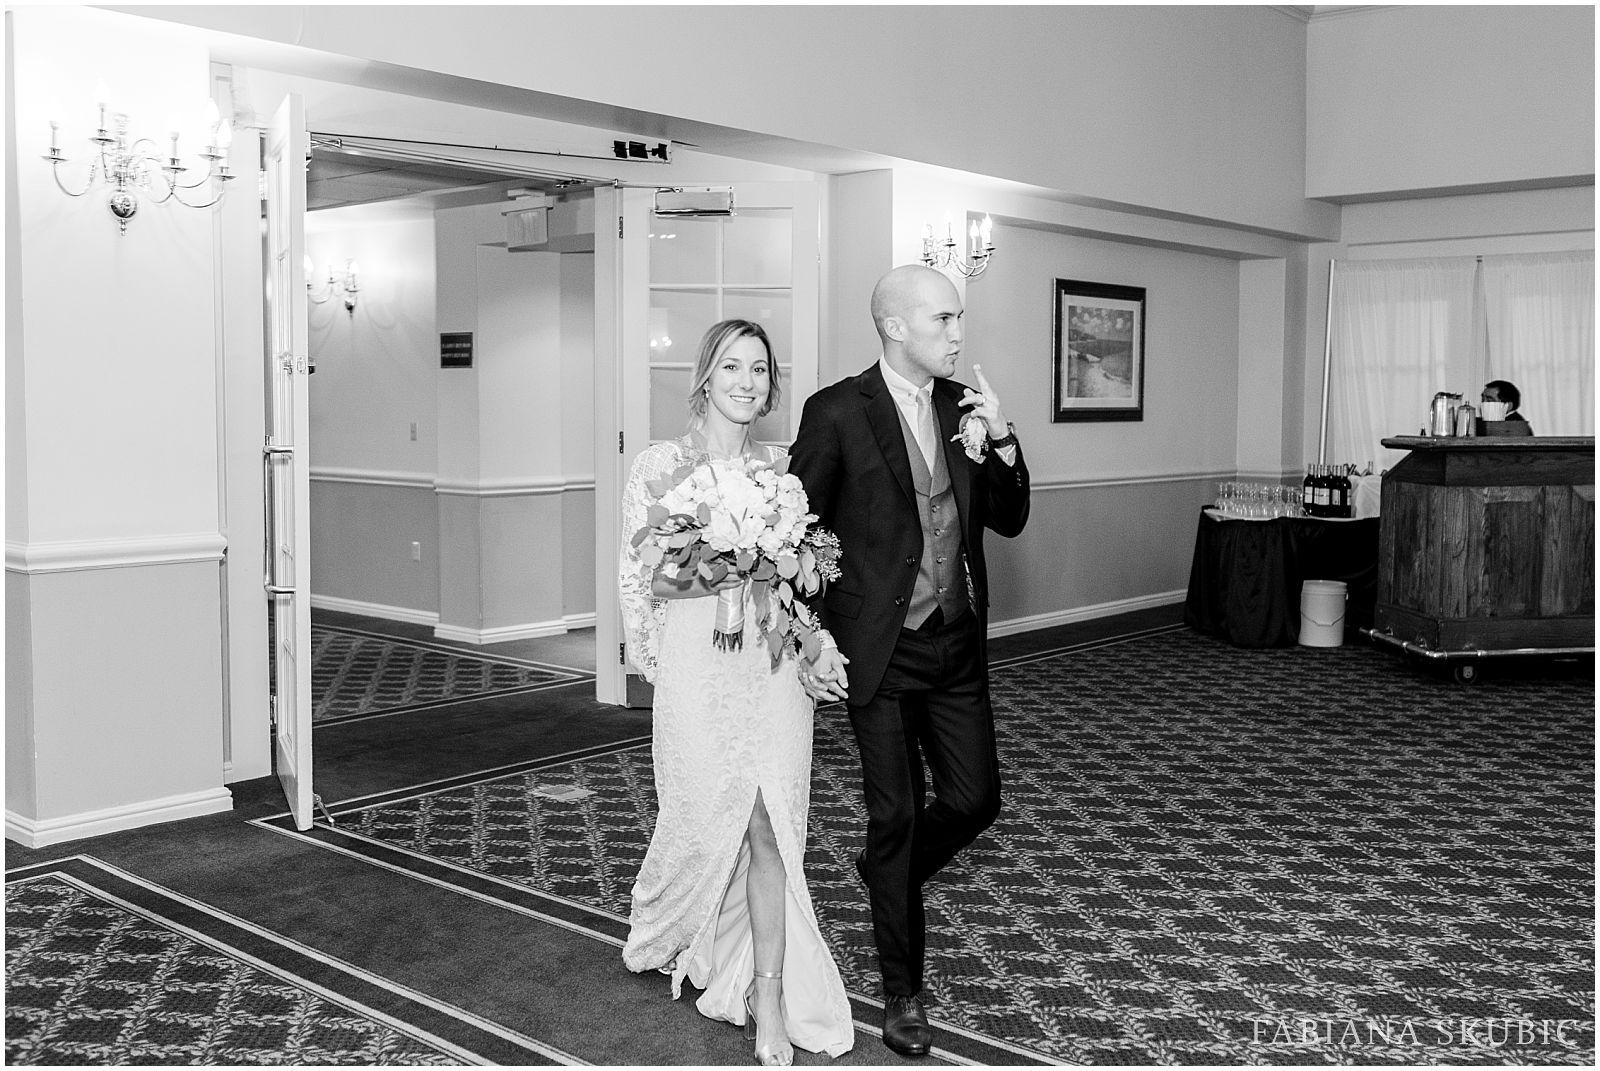 FabianaSkubic_H&M_Wedding_0055.jpg